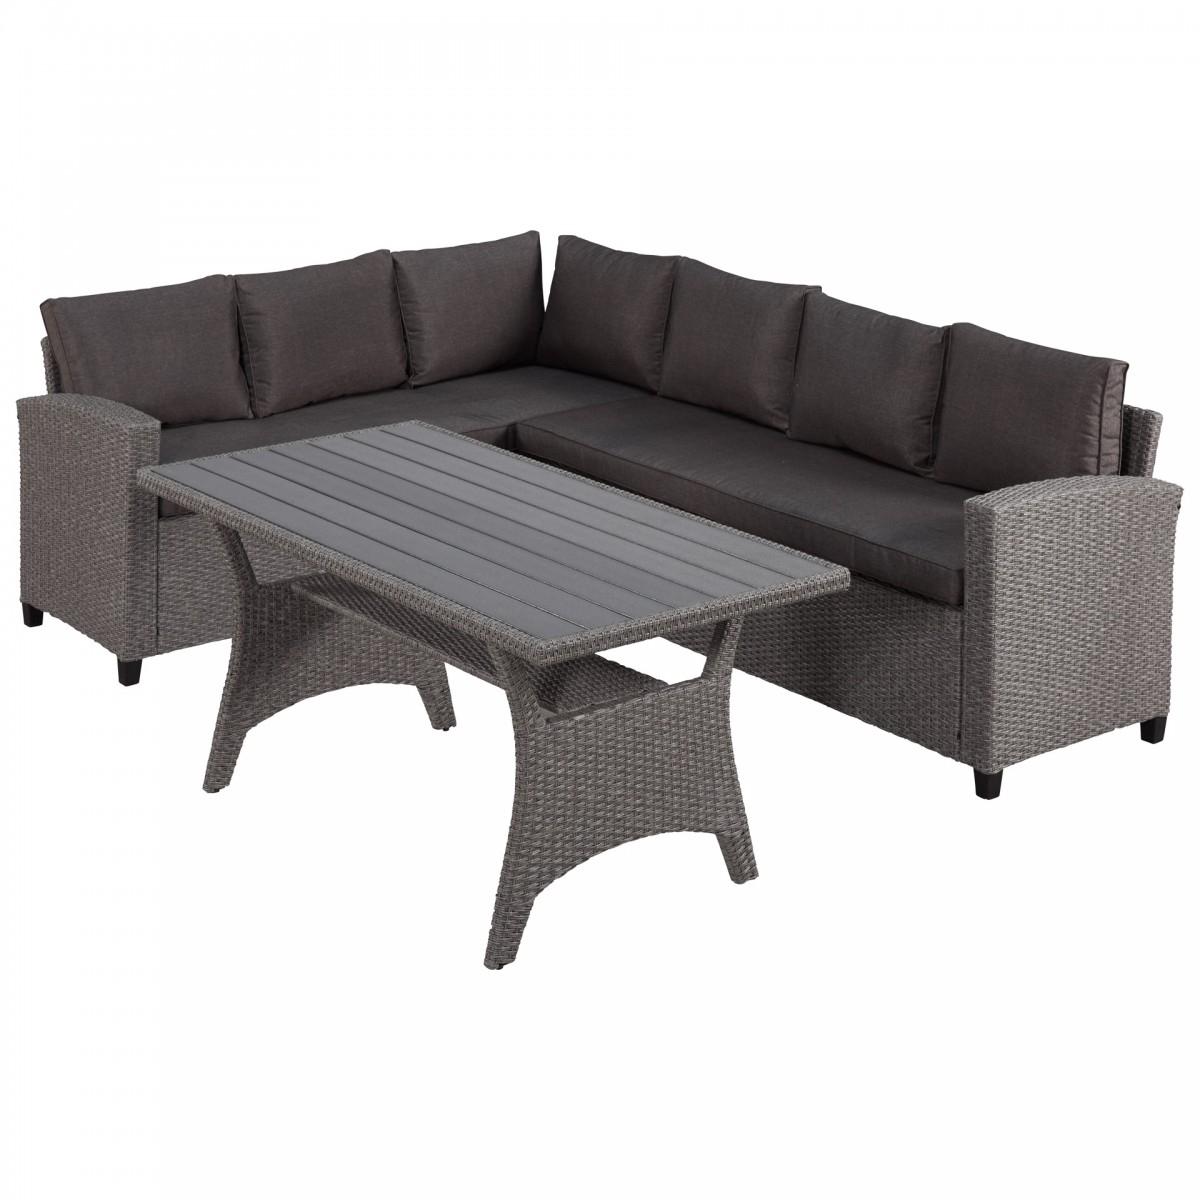 Gartenmöbel - Ecksofa Lounge Set (inkl. Versandkosten)